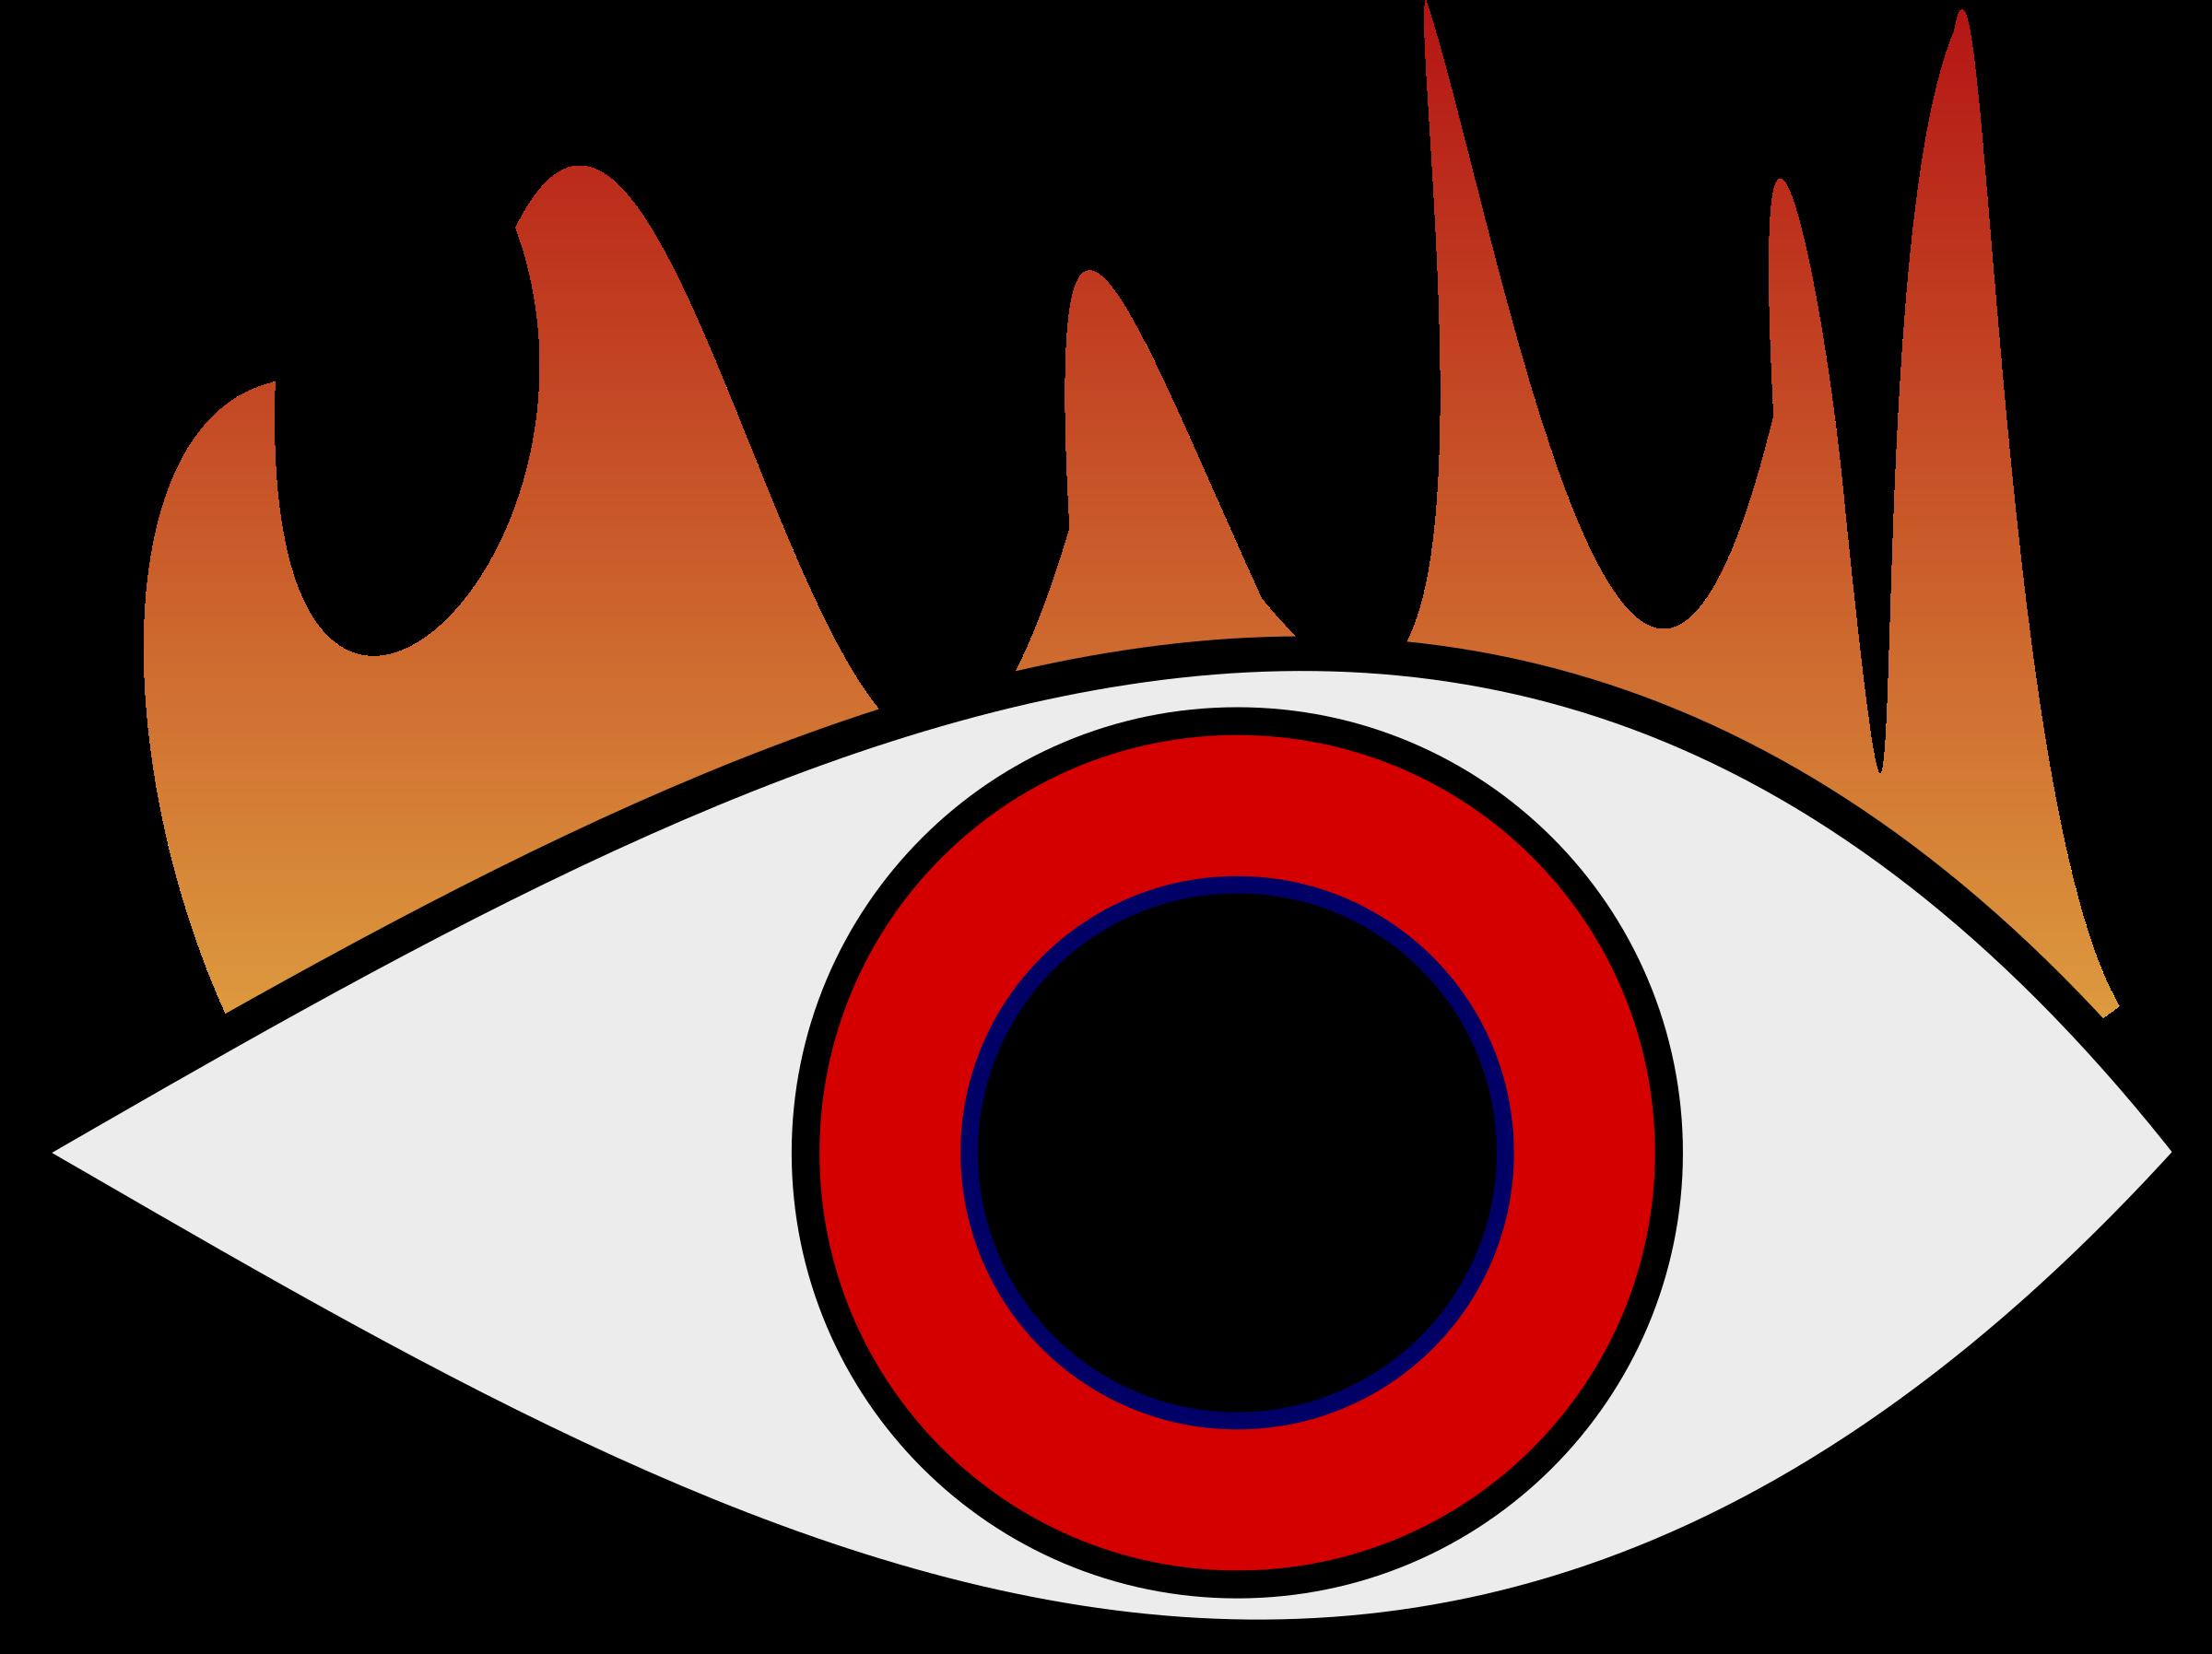 Eyeball clipart eye symbol. Burning big image png